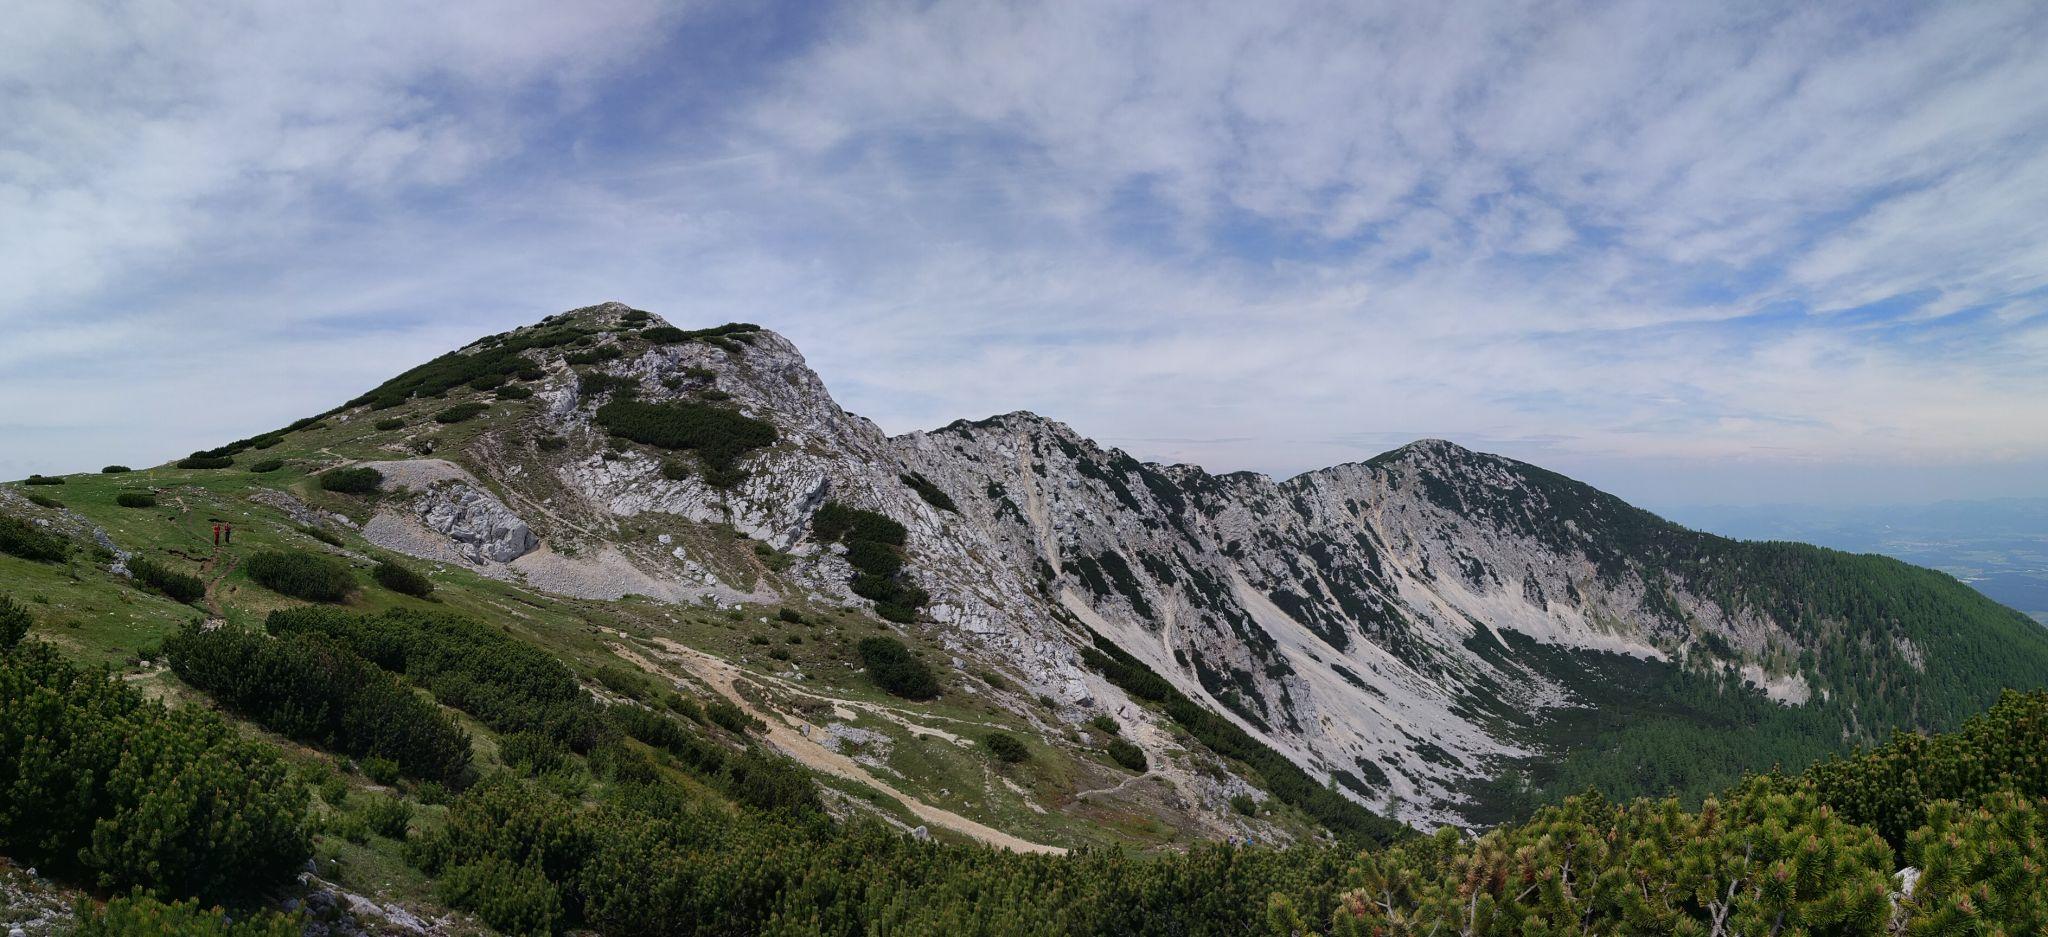 Feistritzer Spitze, Austria